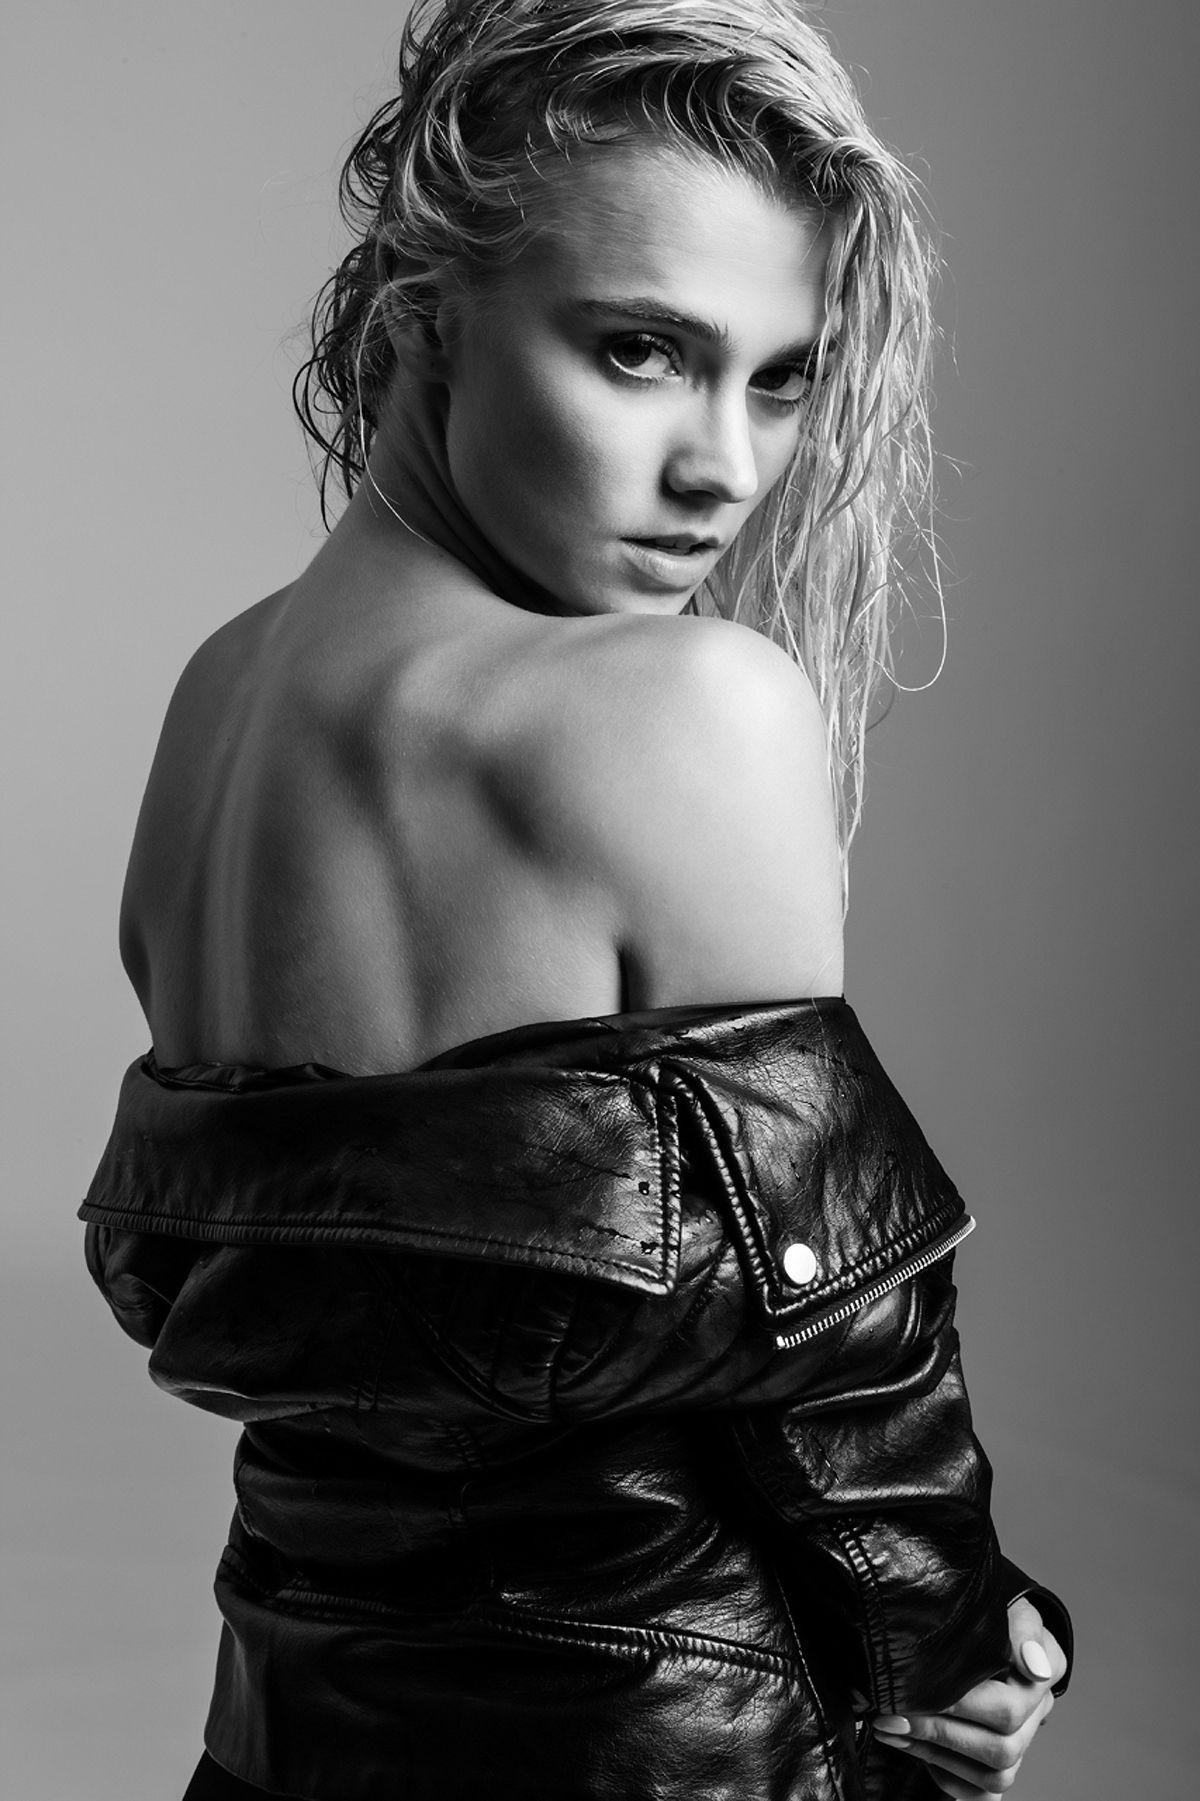 Leather jacket photoshoot - Raina Lawson Wears A Black Leather Jacket At A Jared Thomas Kocka Photoshoot